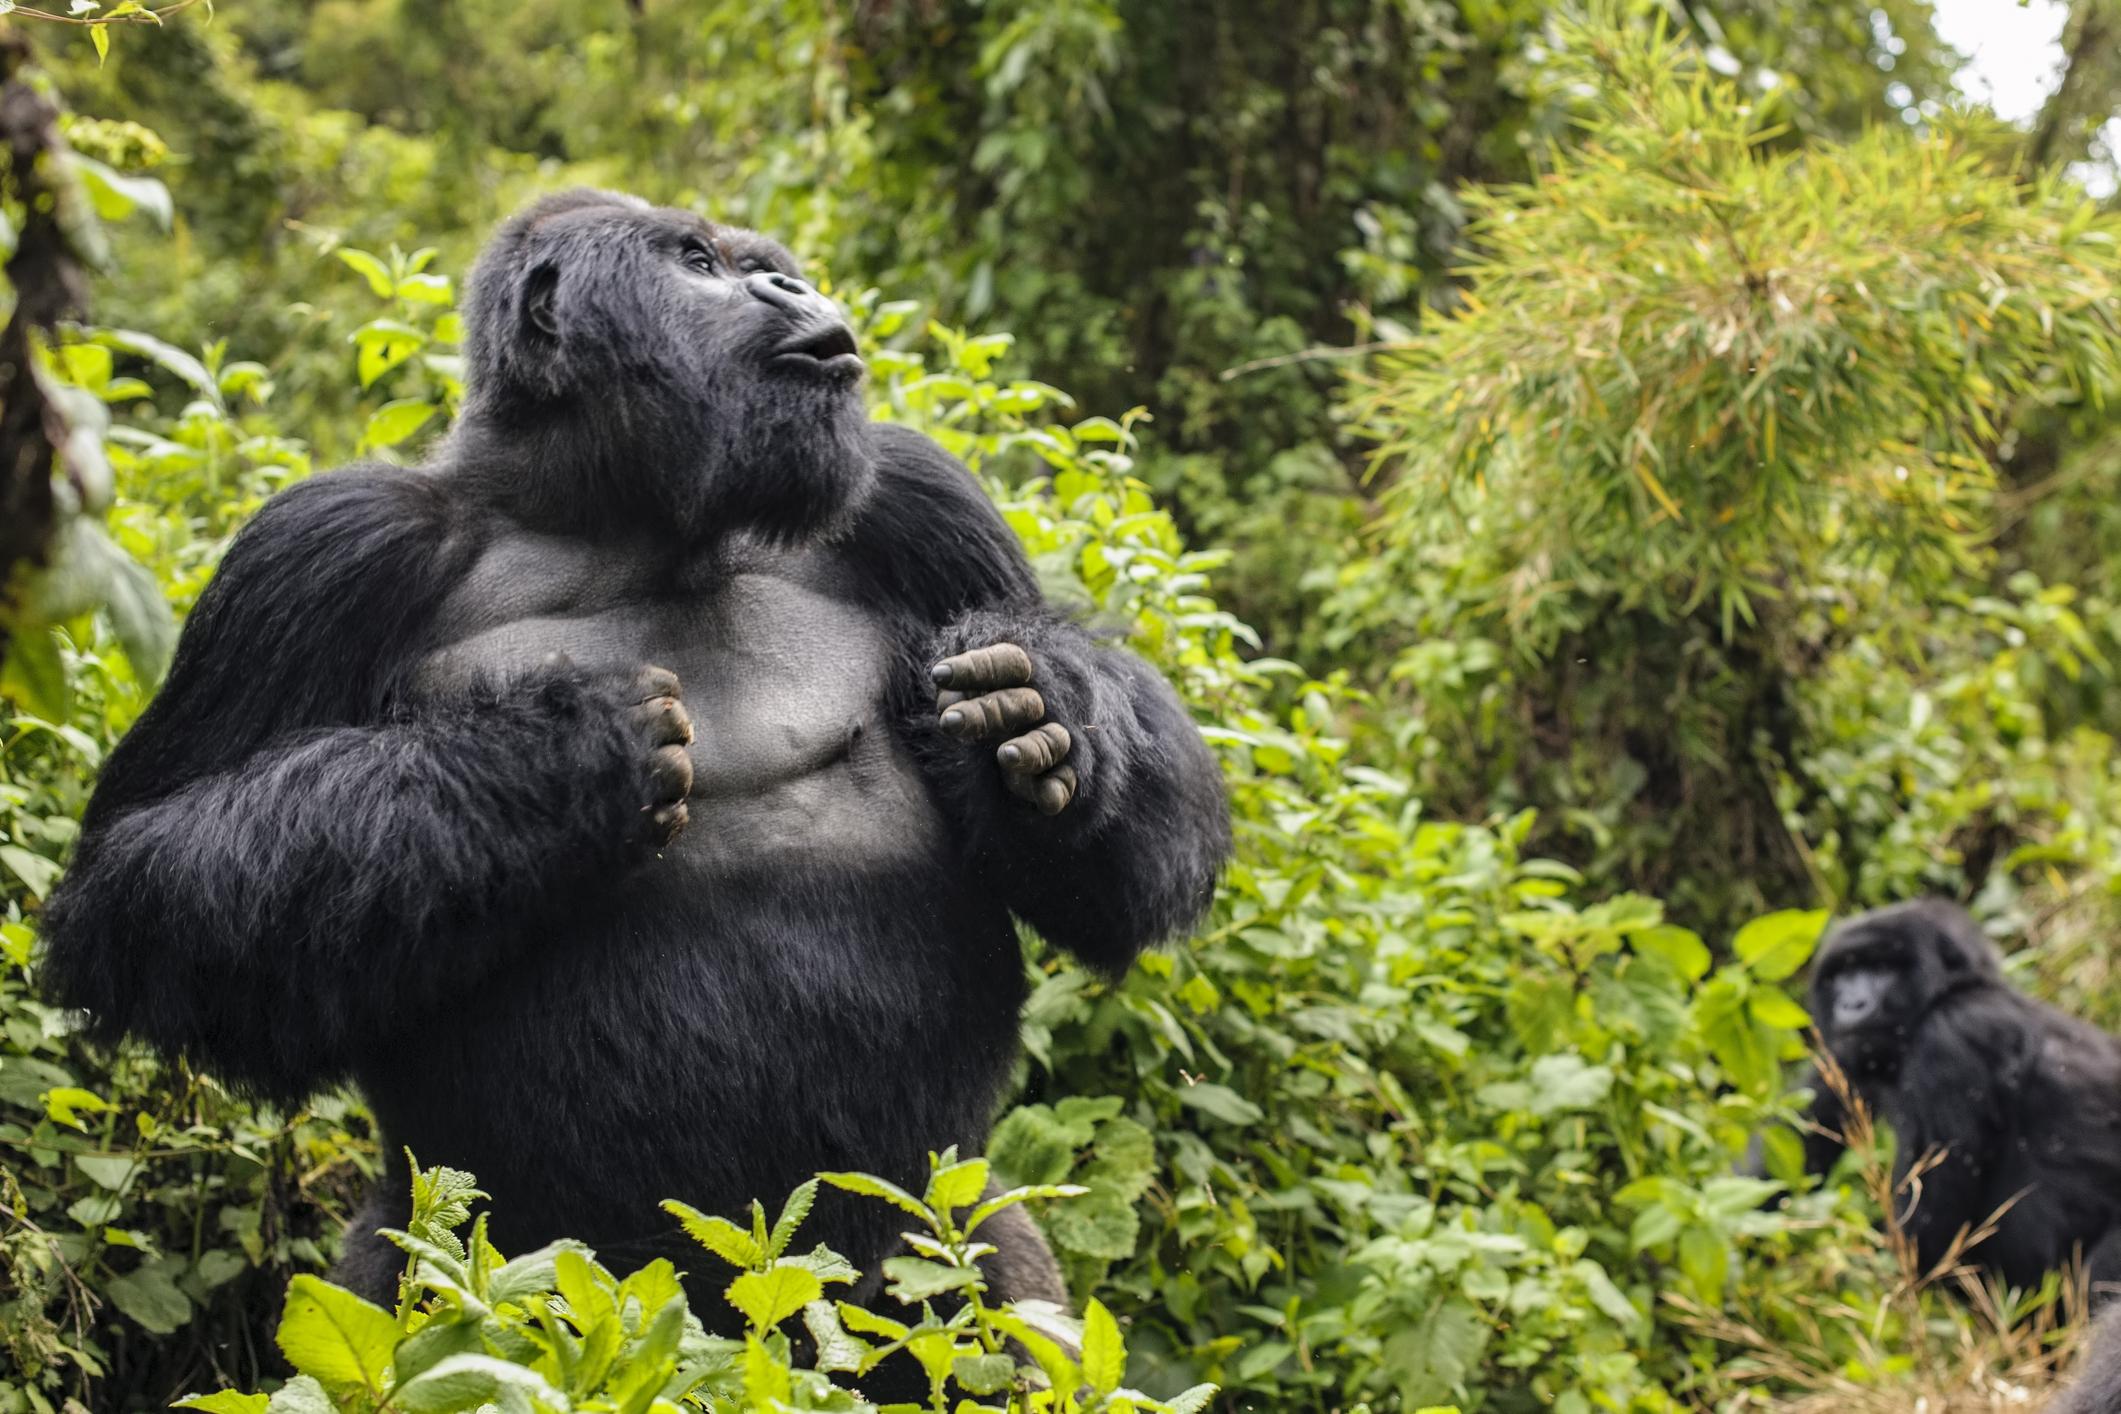 Silverback Mountain Gorilla named Guhonda (Gorilla gorilla beringei) beating his chest, Parc National des Volcans, Rwanda, Africa